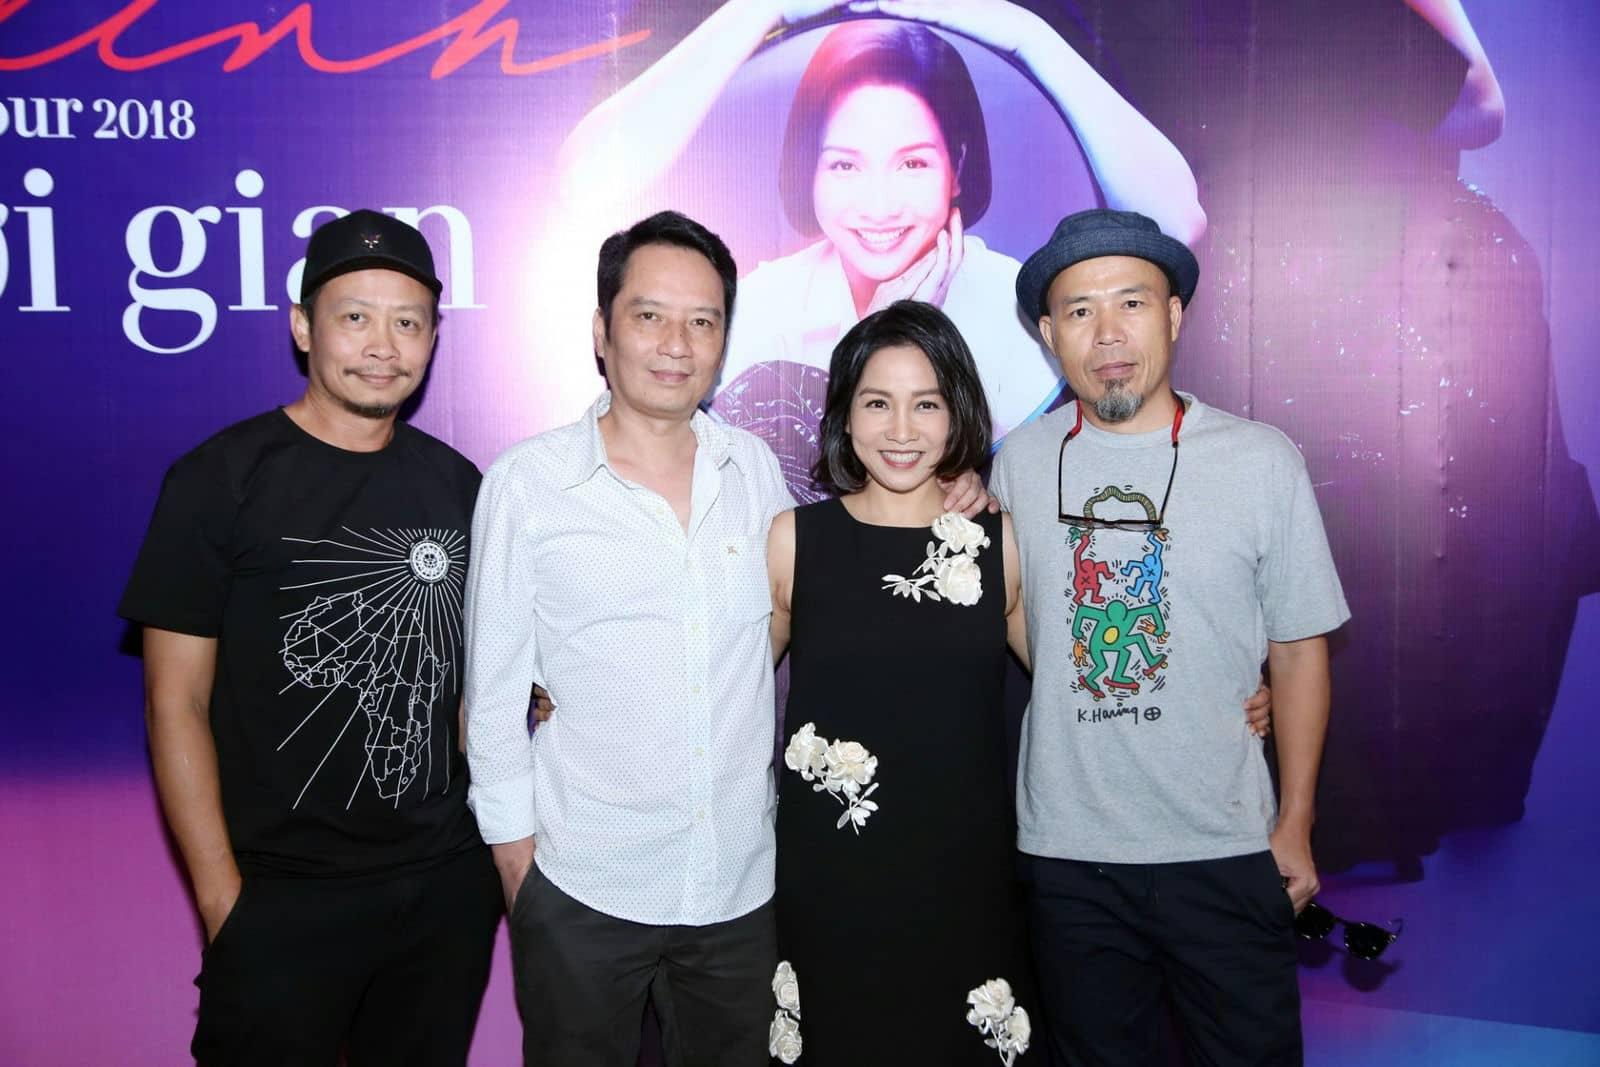 Mỹ Linh Tour 2018 - Thời Gian